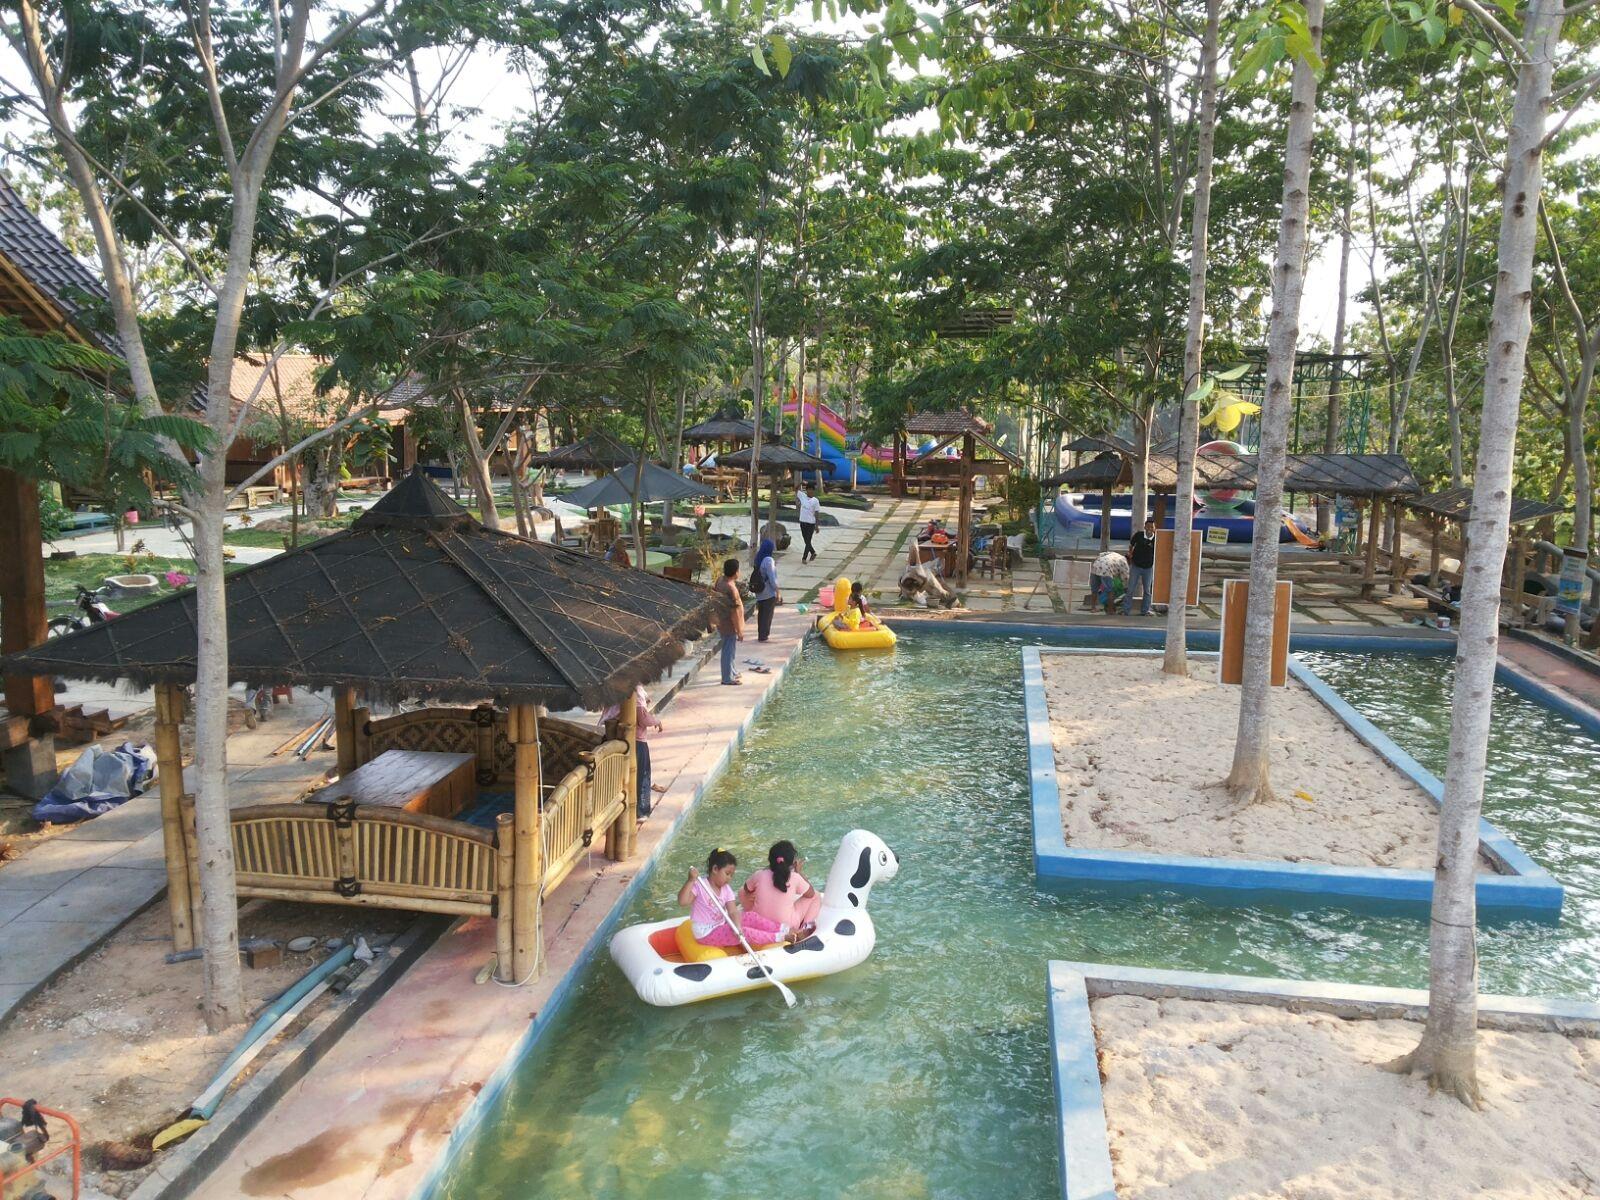 18 Tempat Wisata Blora Jawa Tengah Terkenal Aneka Kampung Gojekan